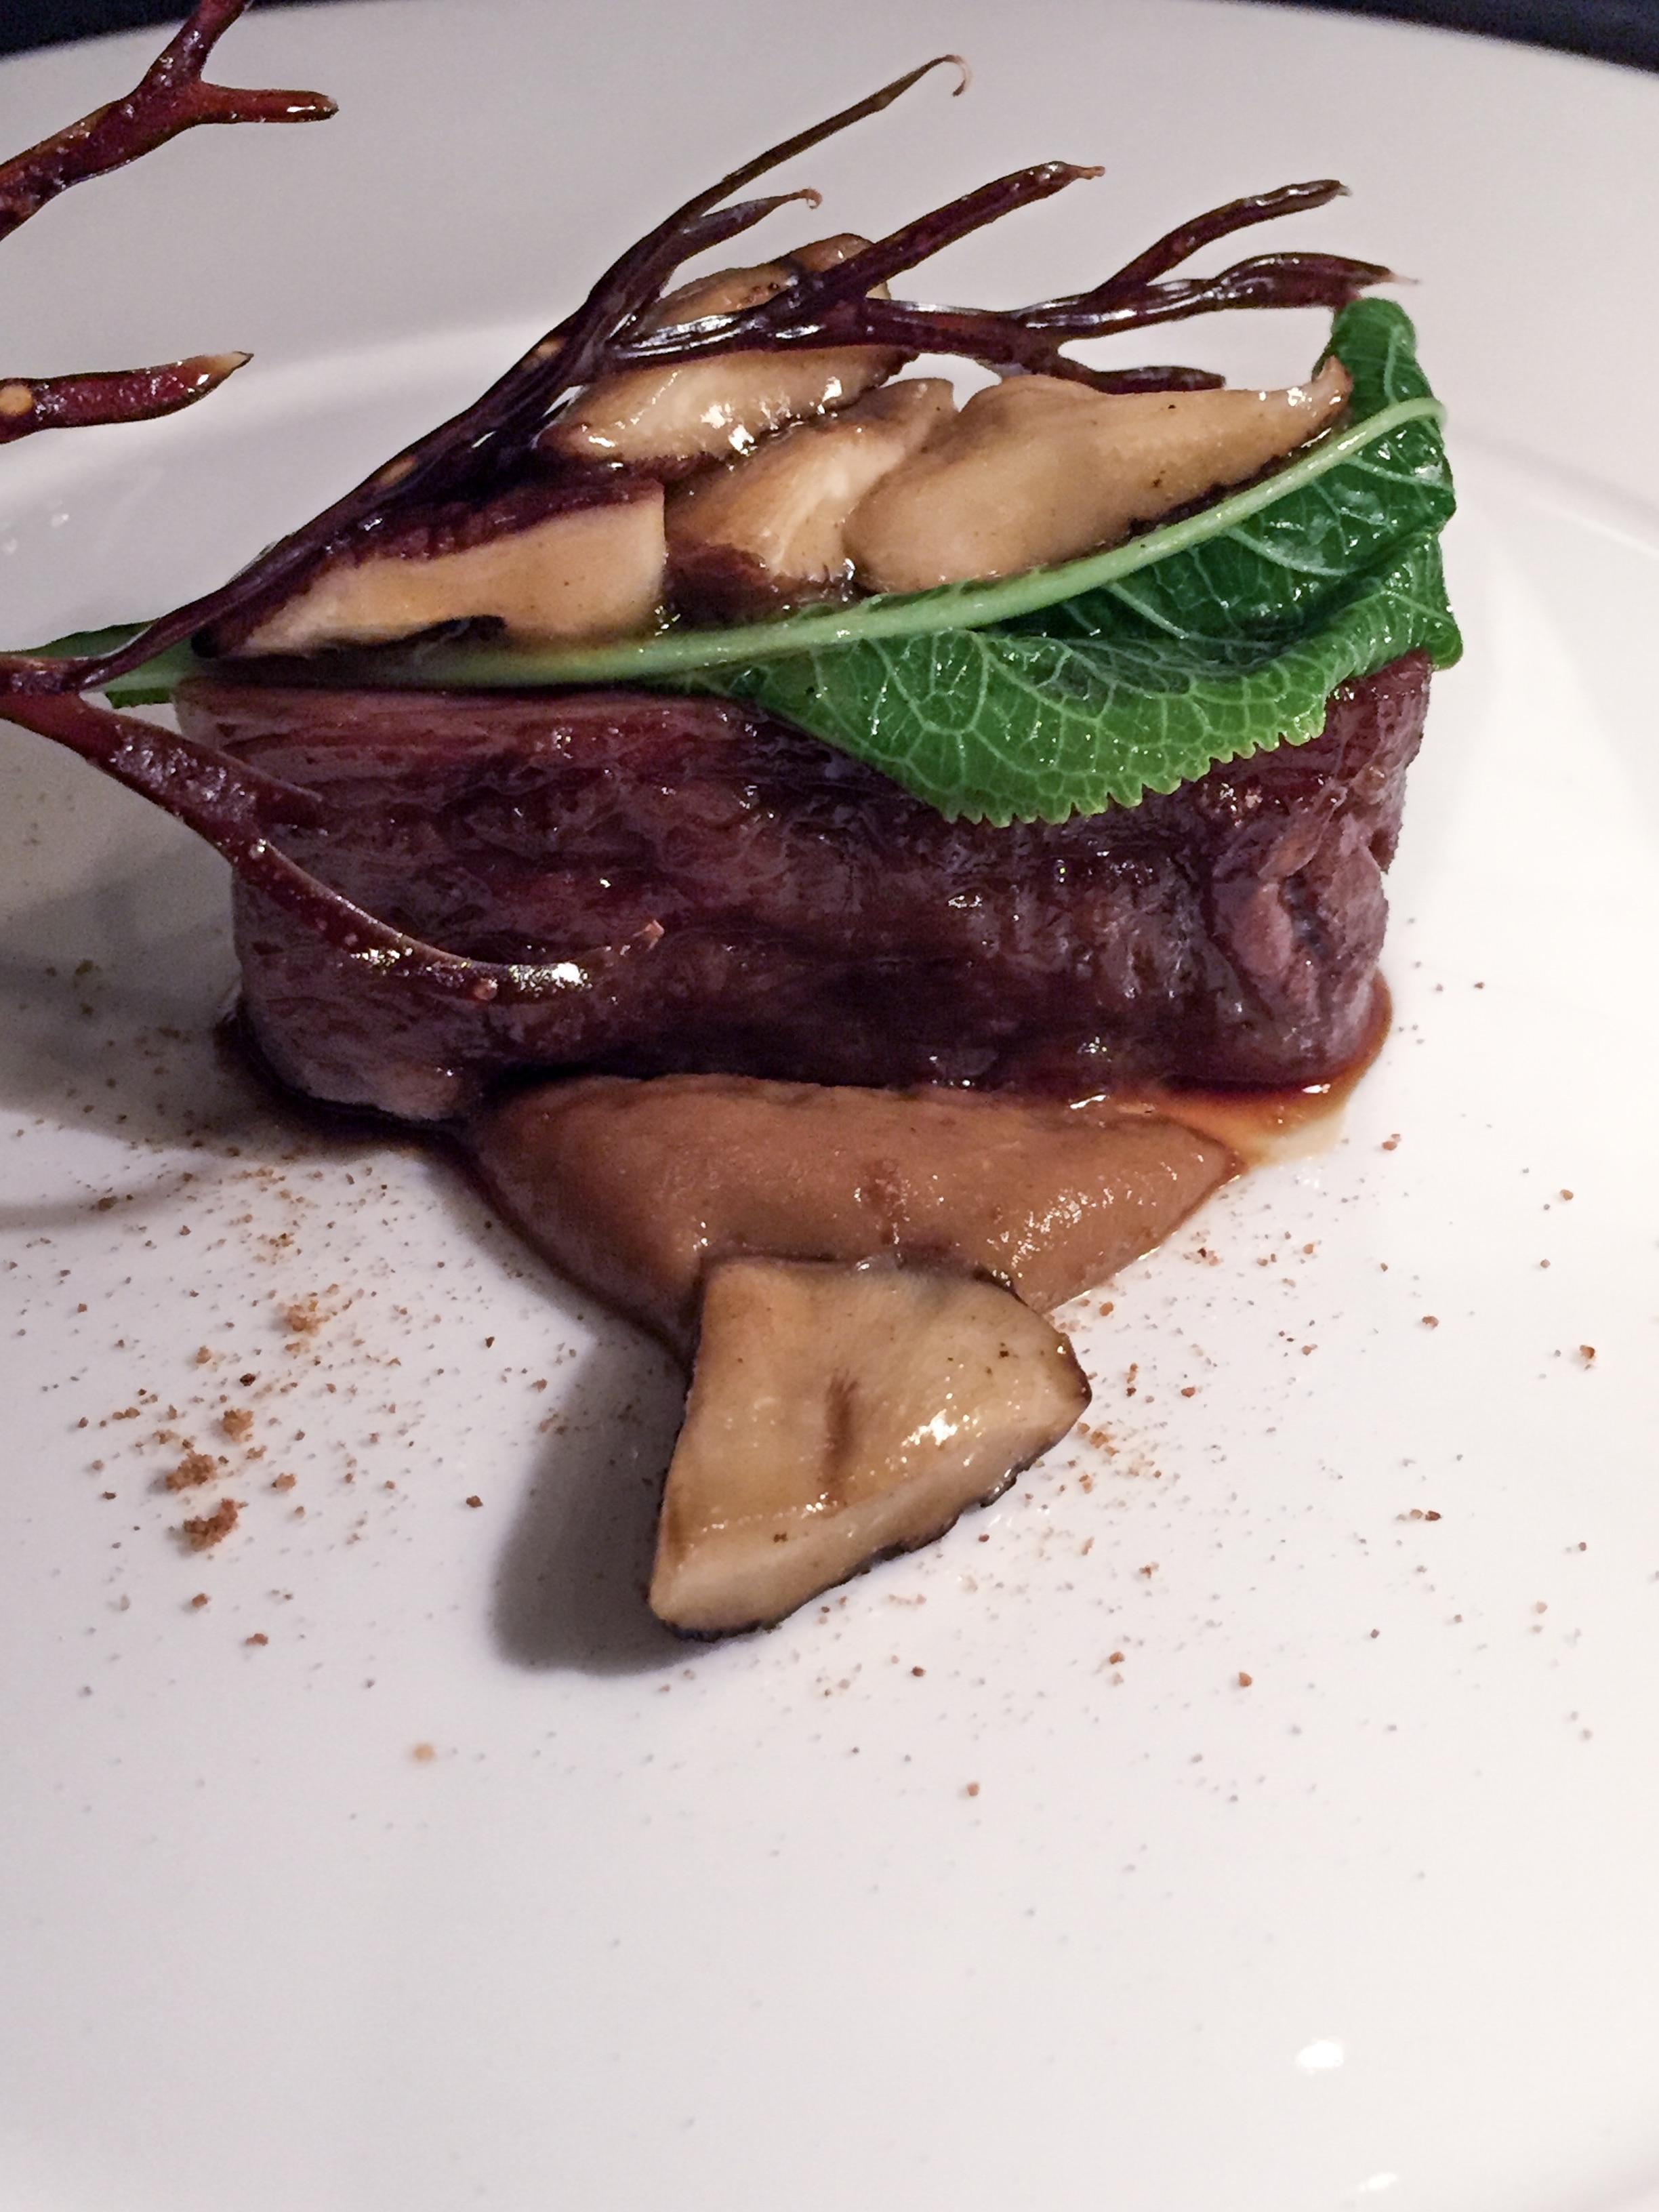 David Blackmore wagyu, shiitake mushroom, roasted onion and mustard, horseradish leaf, shiso